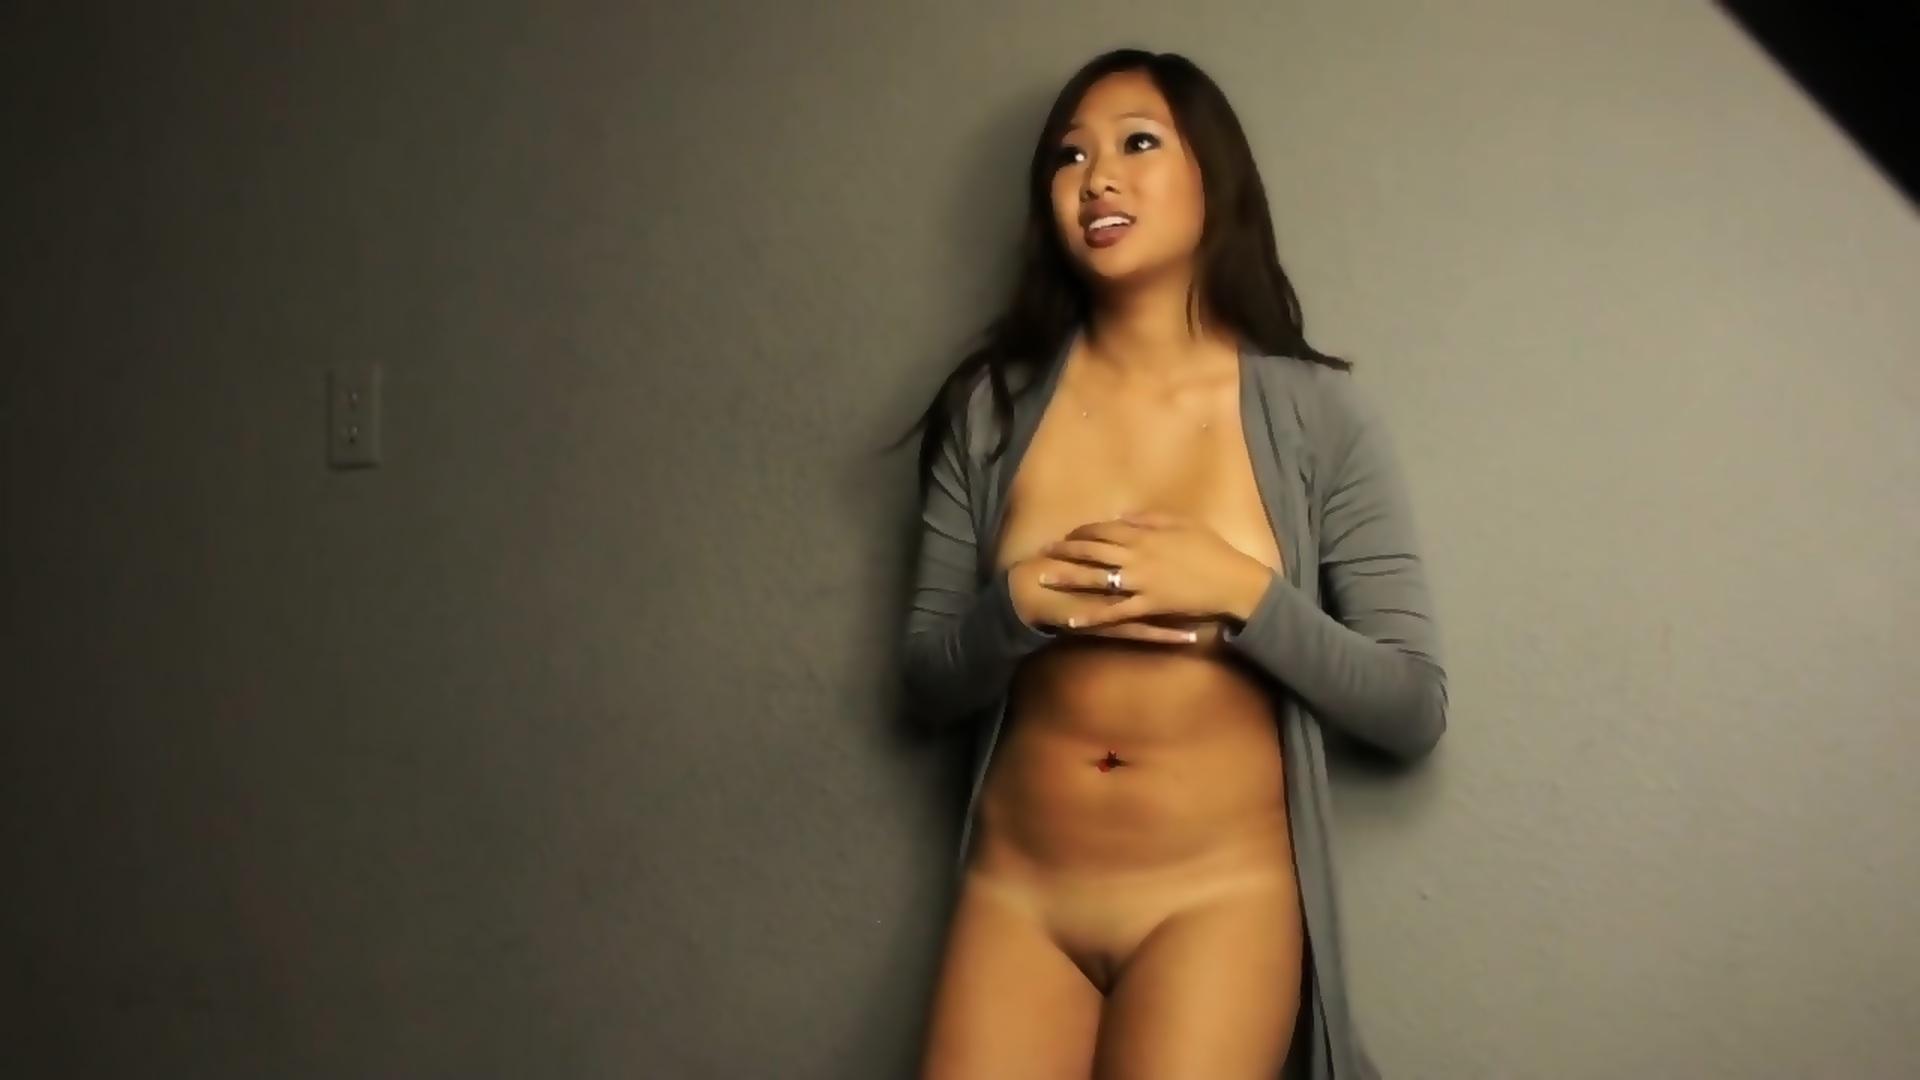 Asian models strip